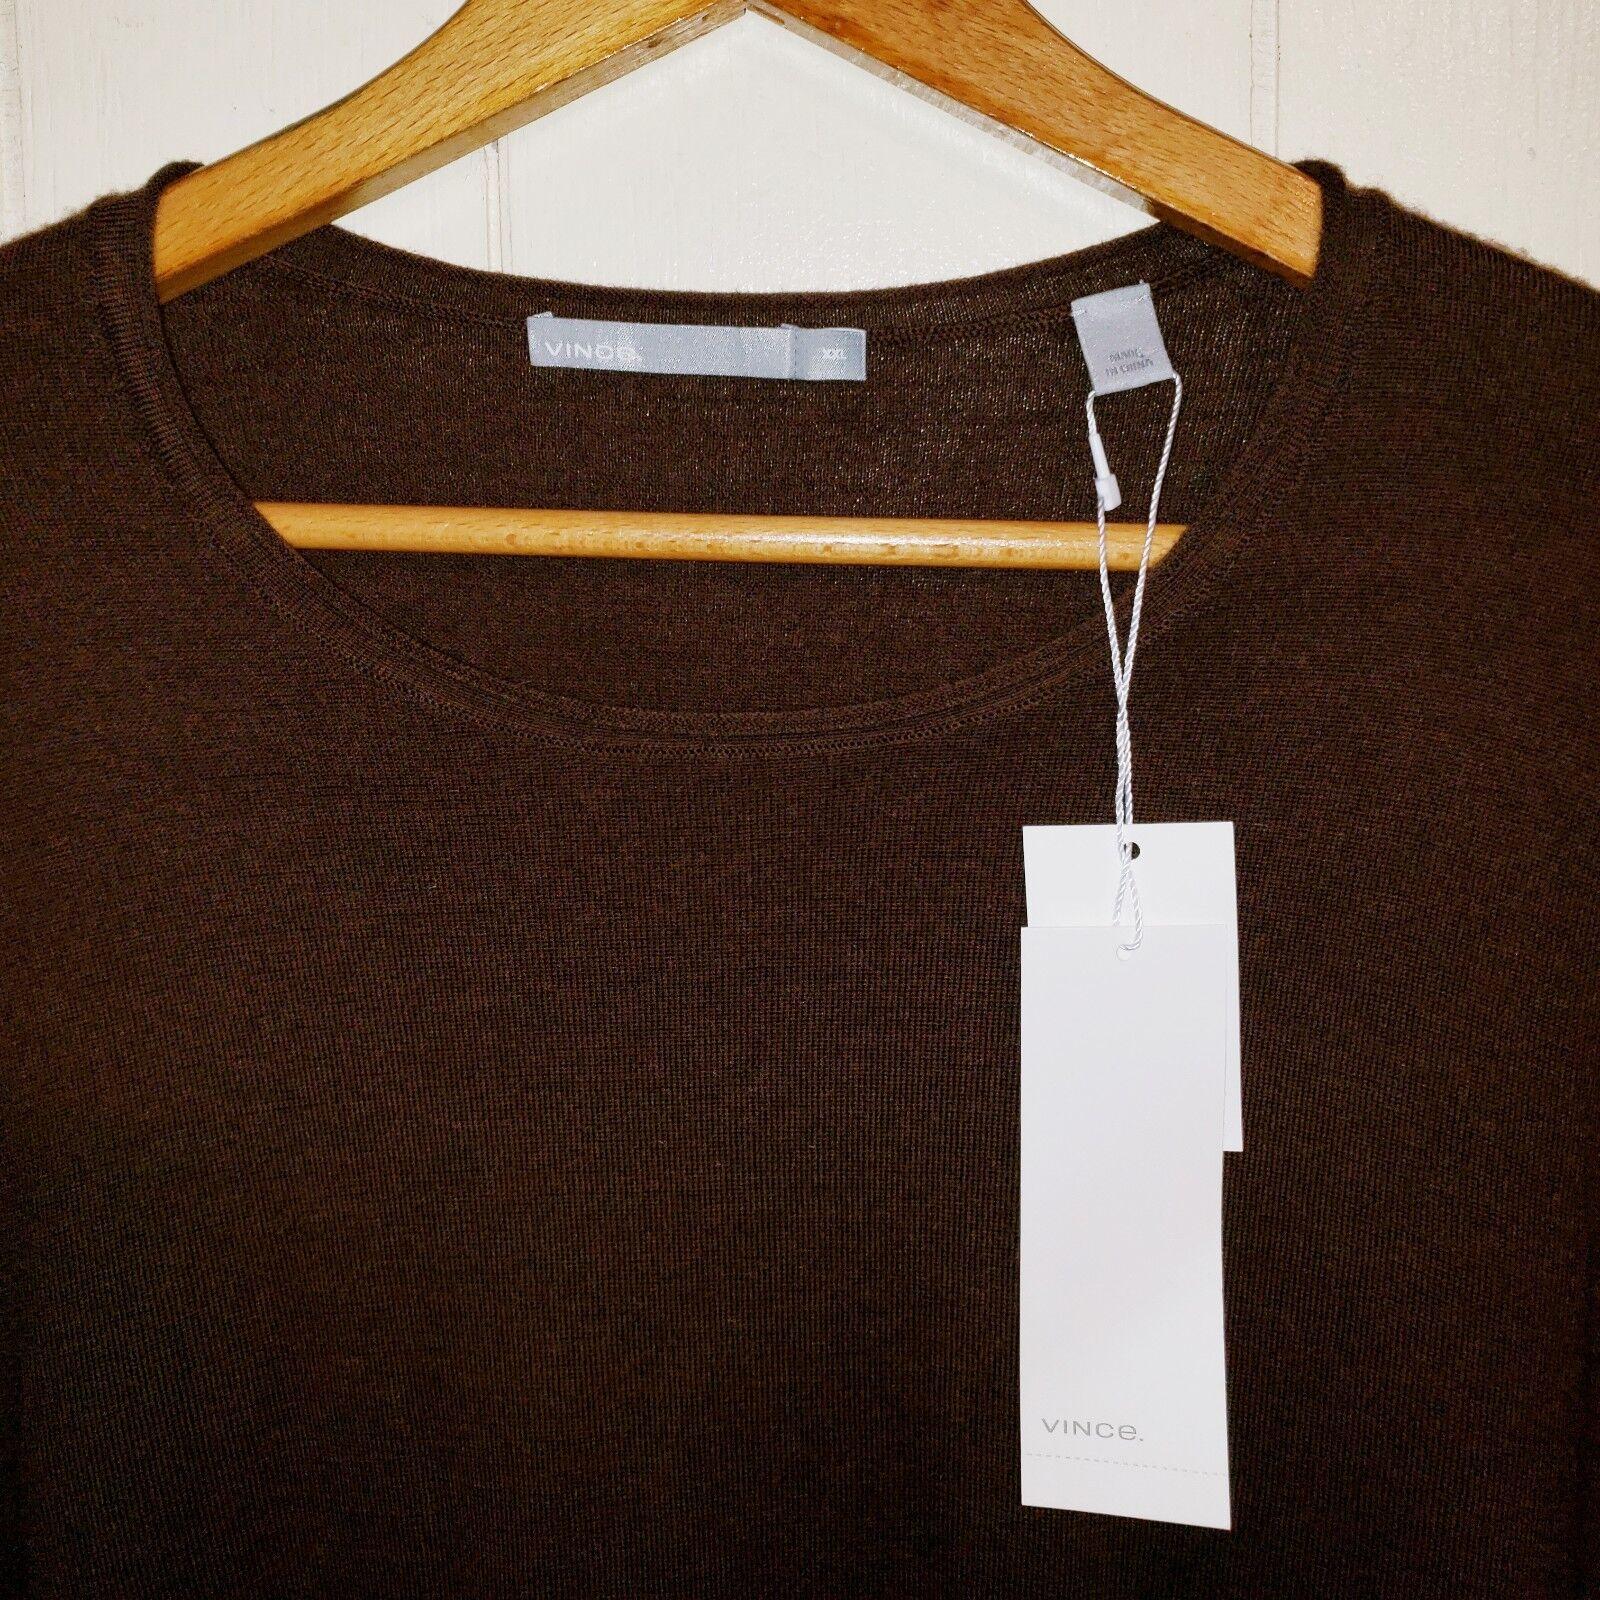 Vince Wool Cashmere Sweater Shirt Mens 2XL NEW  285.00 Brown